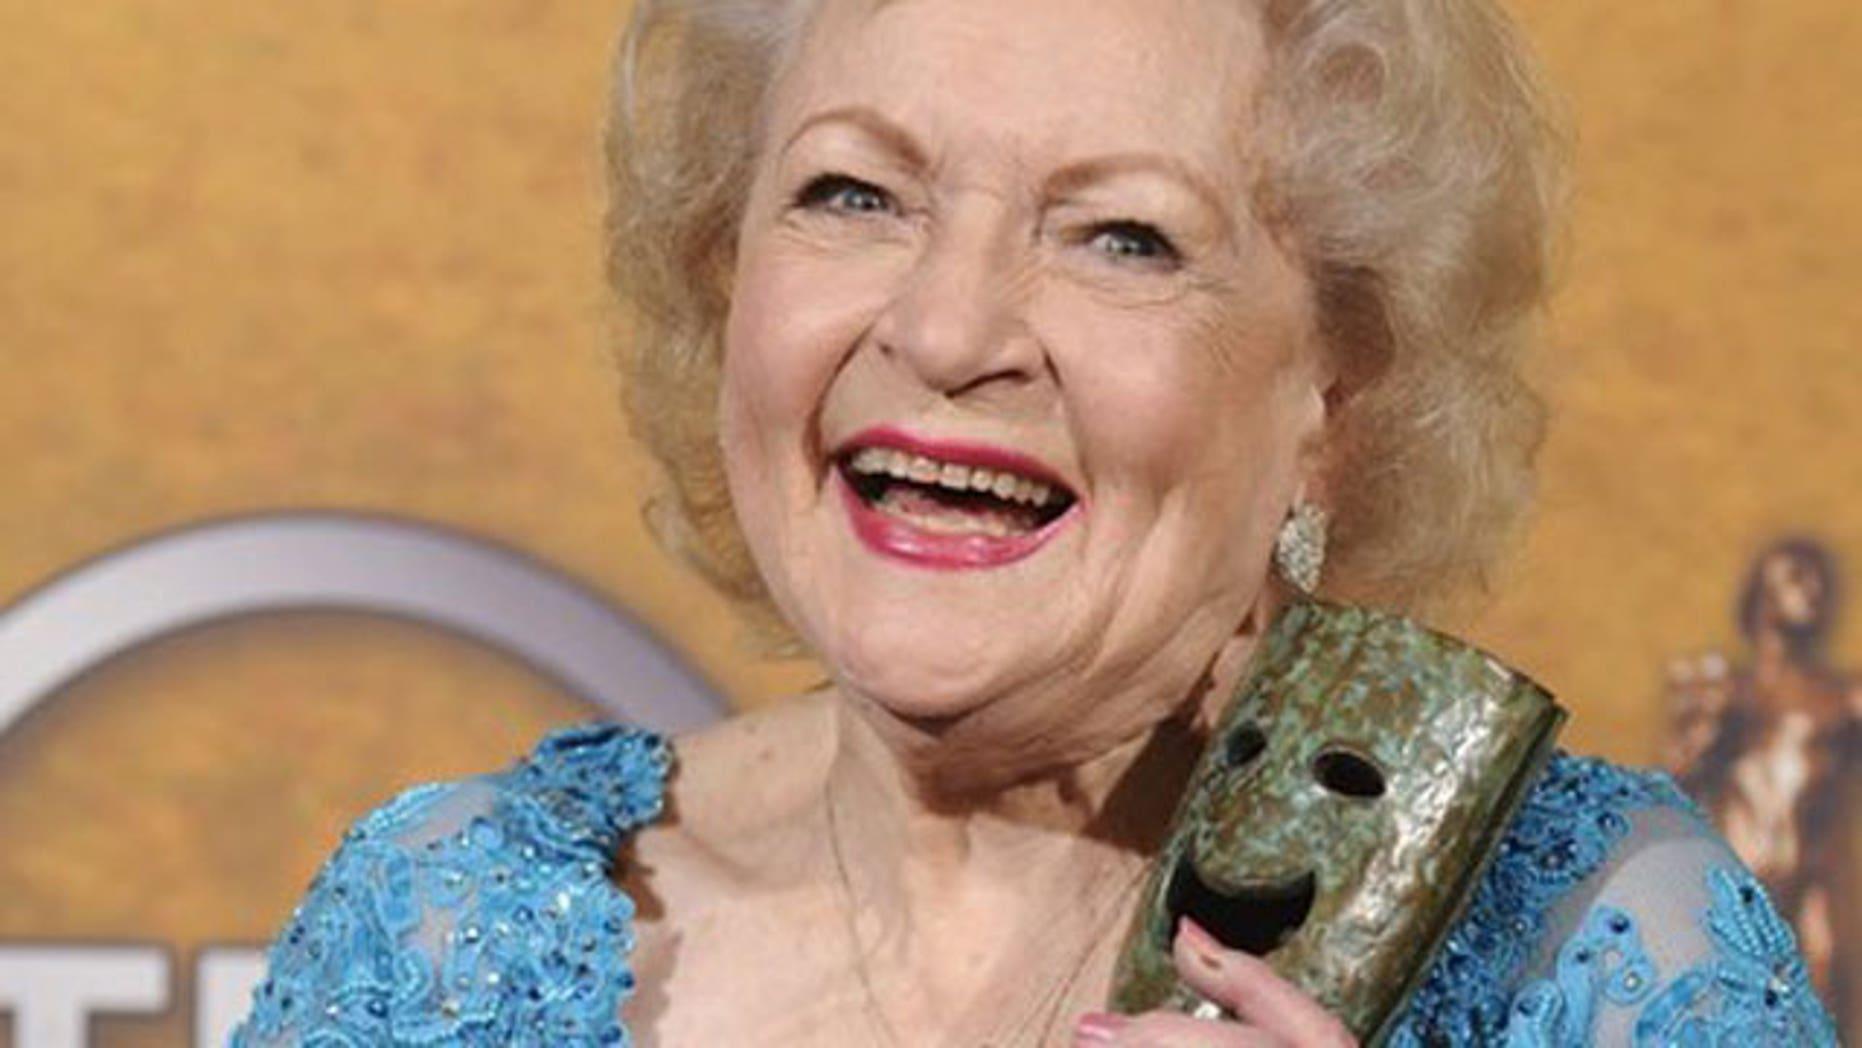 First she announced a 2011 calendar, now actress Betty White has scored a 2 book deal.